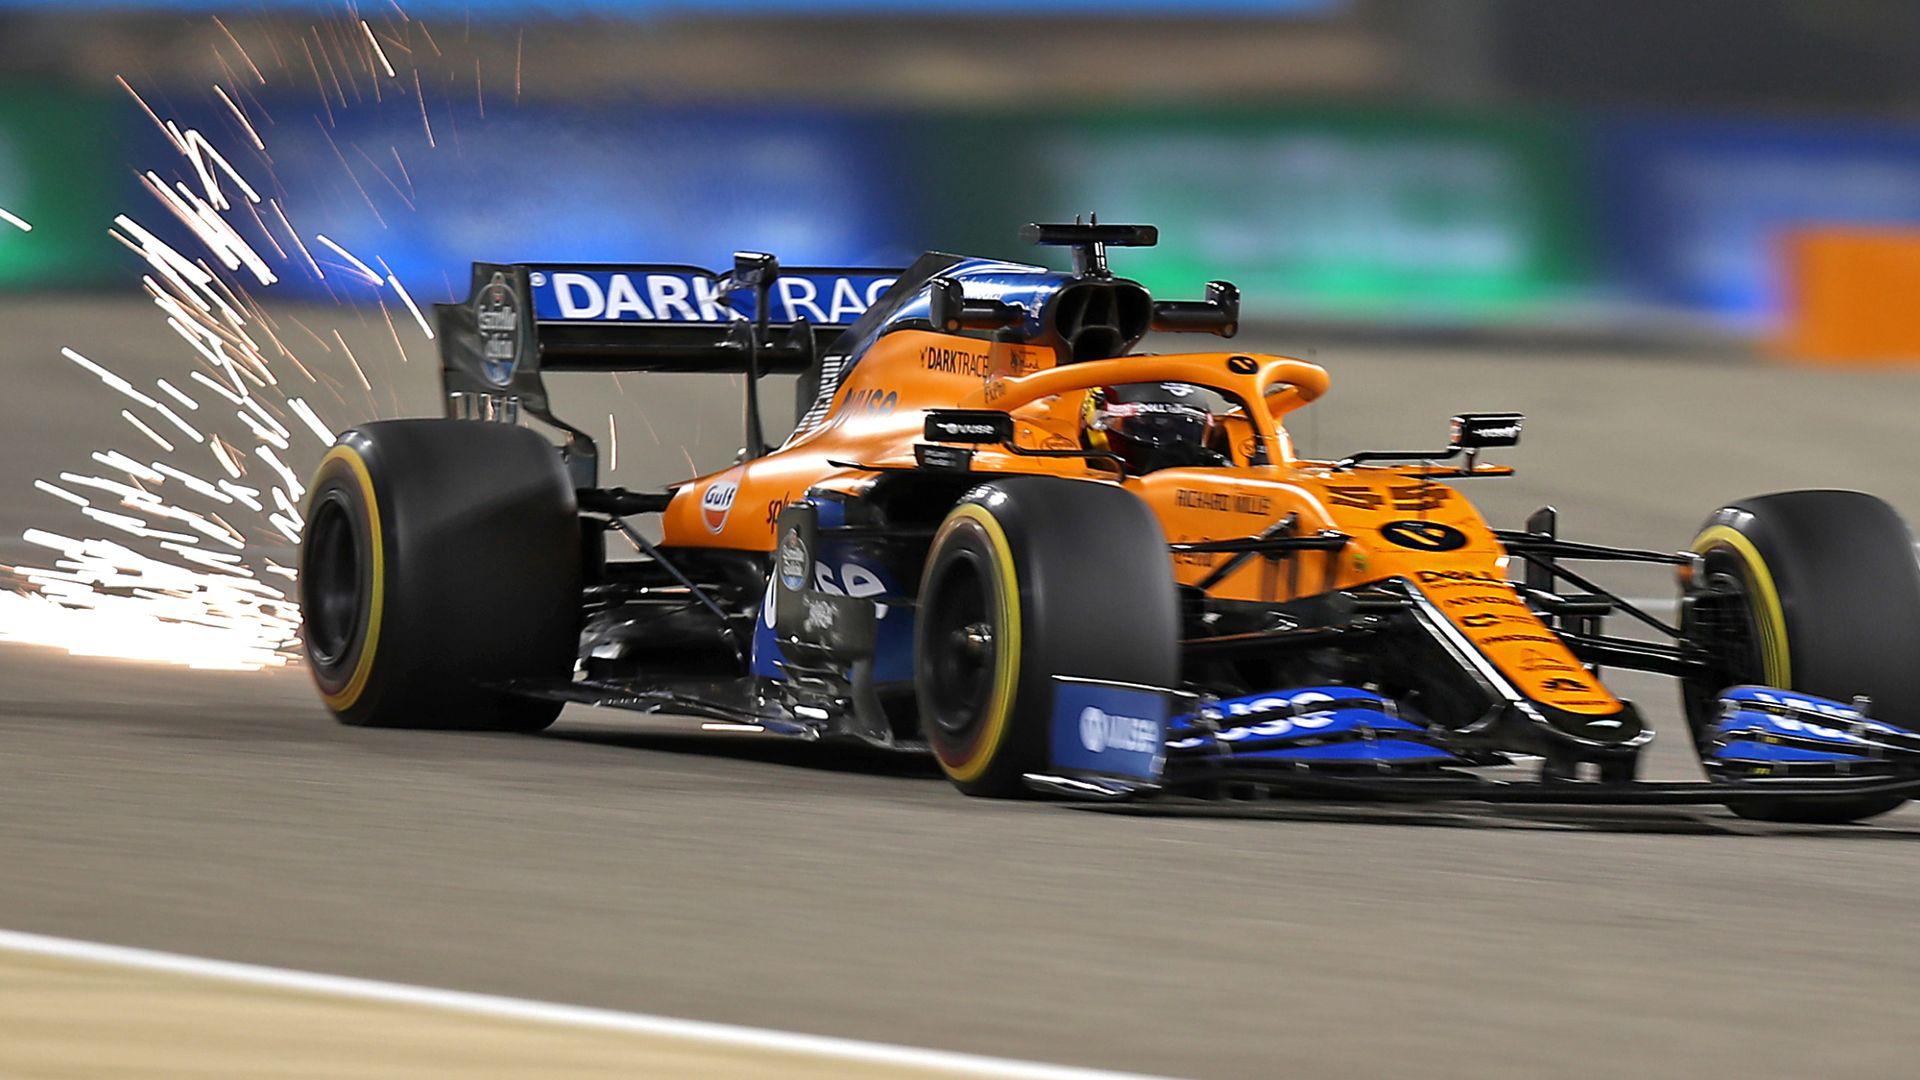 Bahrain GP Practice Three LIVE!